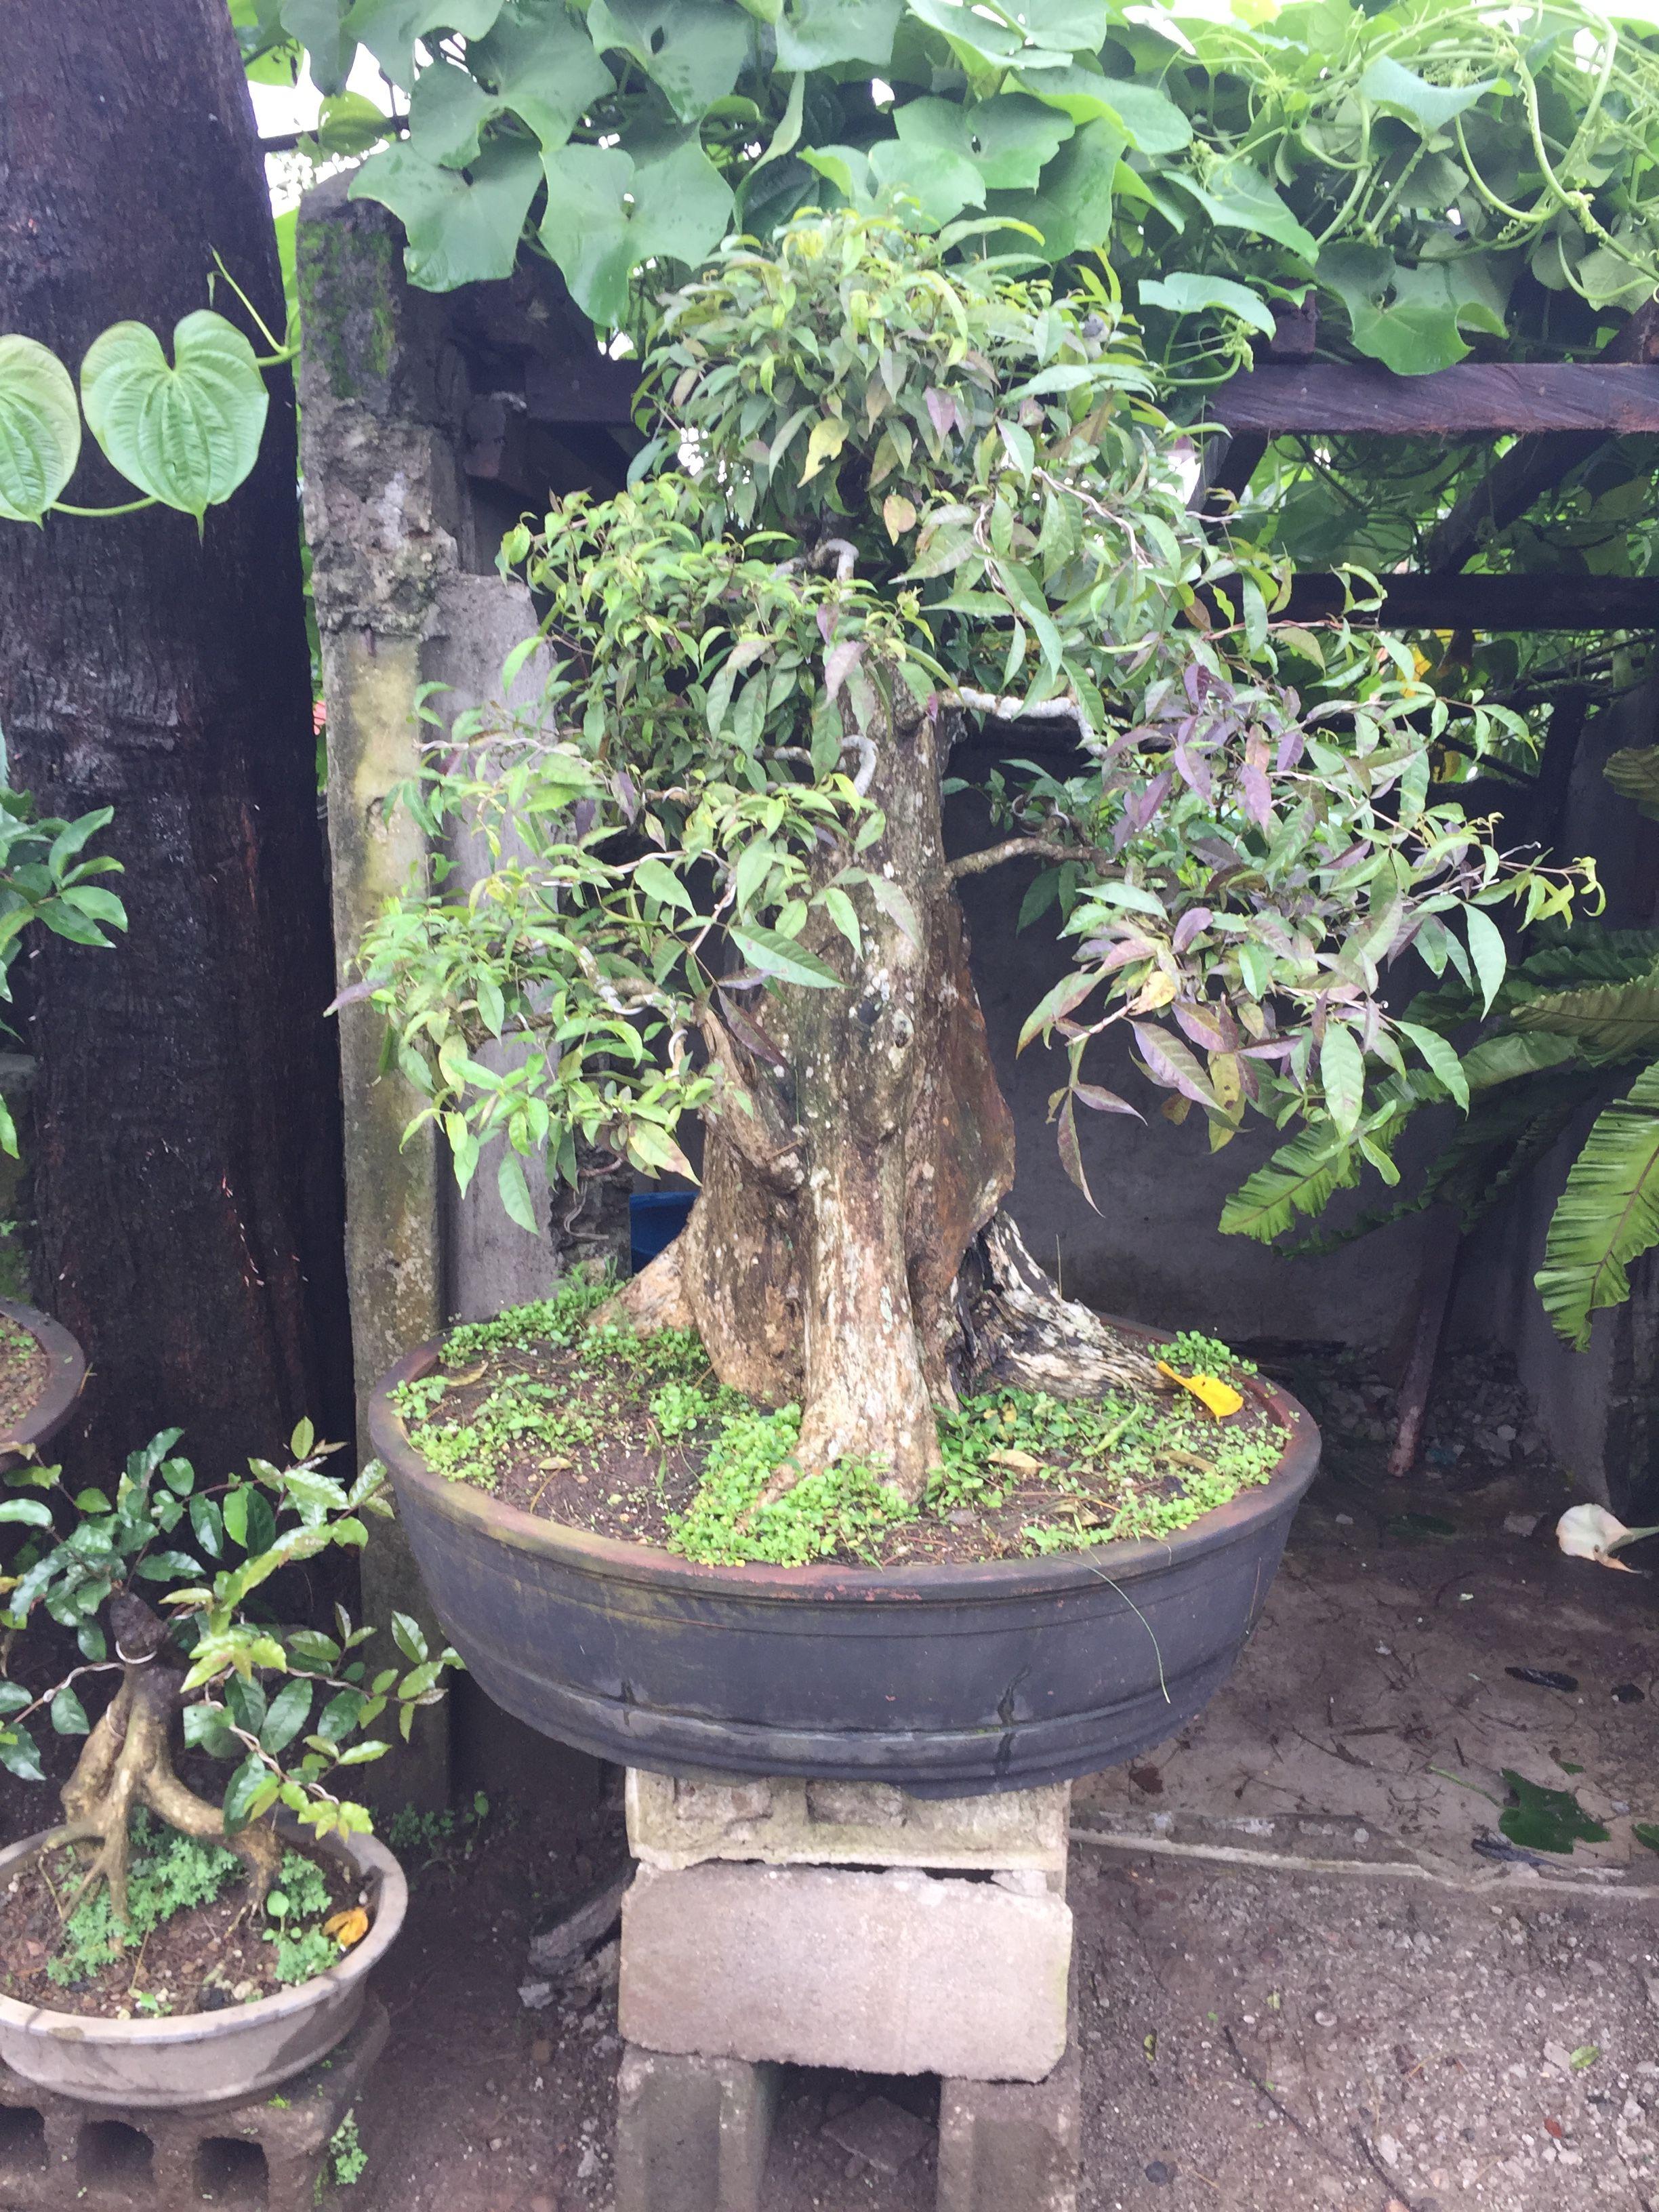 Roadside Bonsai Sales Tagaytay Philippines Bougainvillea Bonsai Bonsai Tree Plants